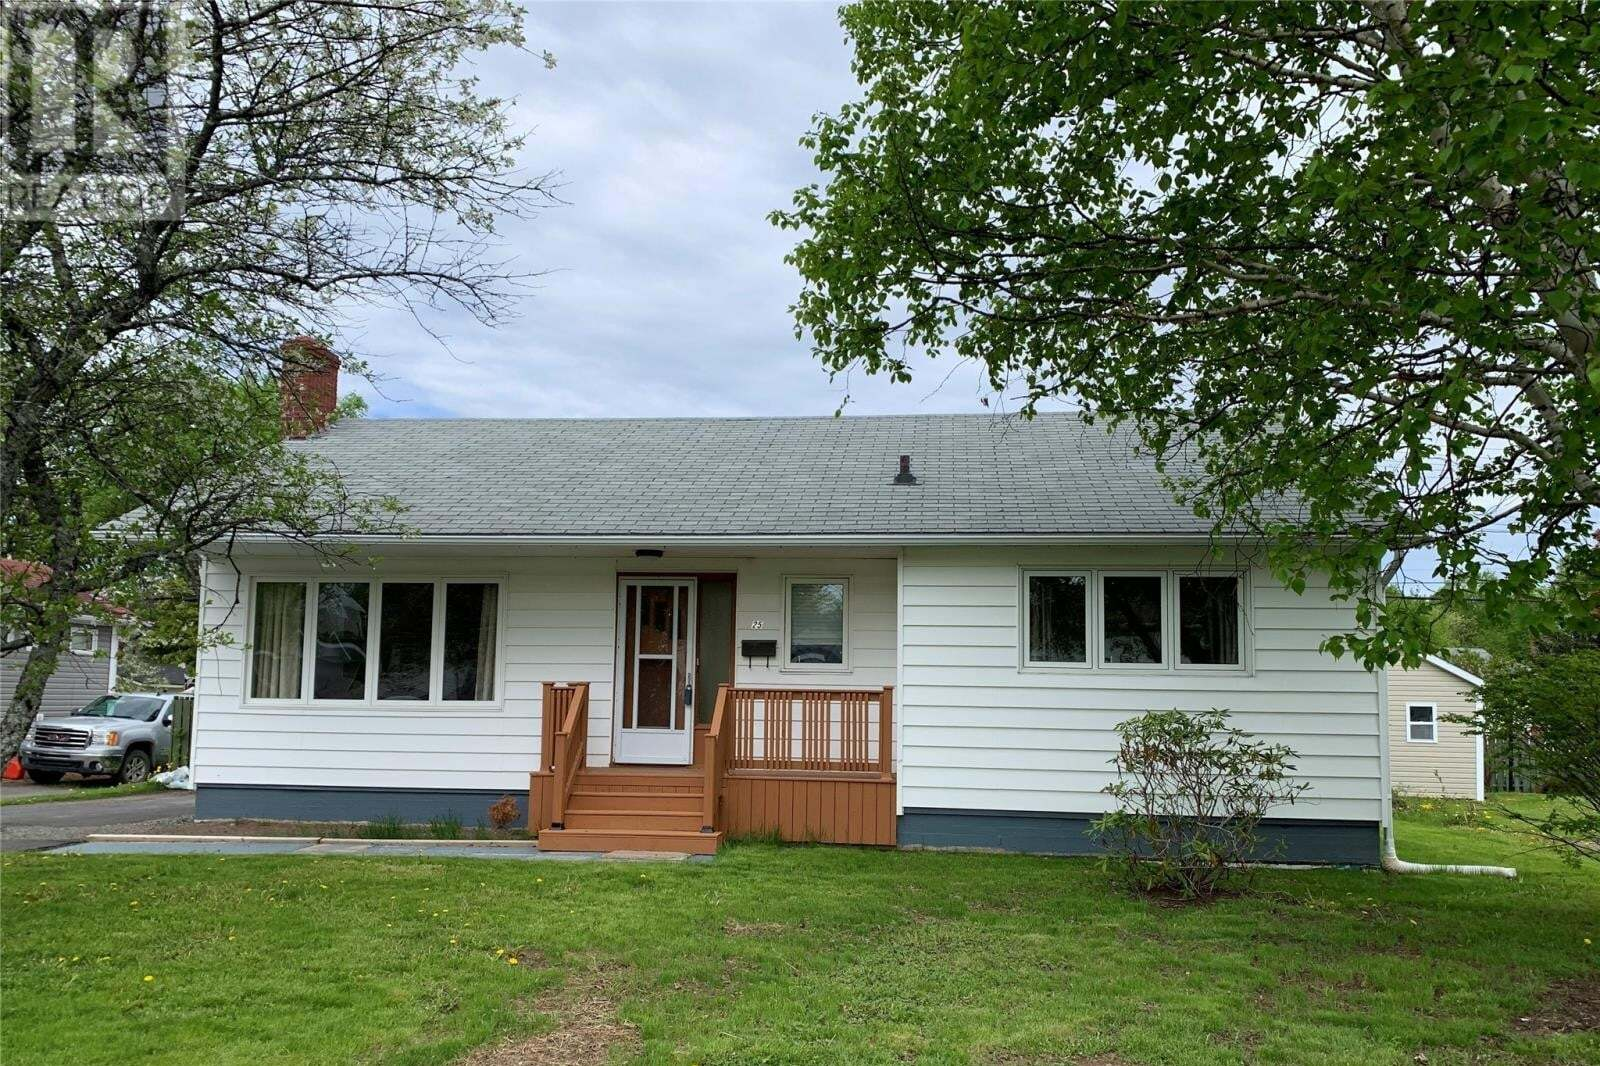 House for sale at 25 Birch St Grand Falls - Windsor Newfoundland - MLS: 1212084